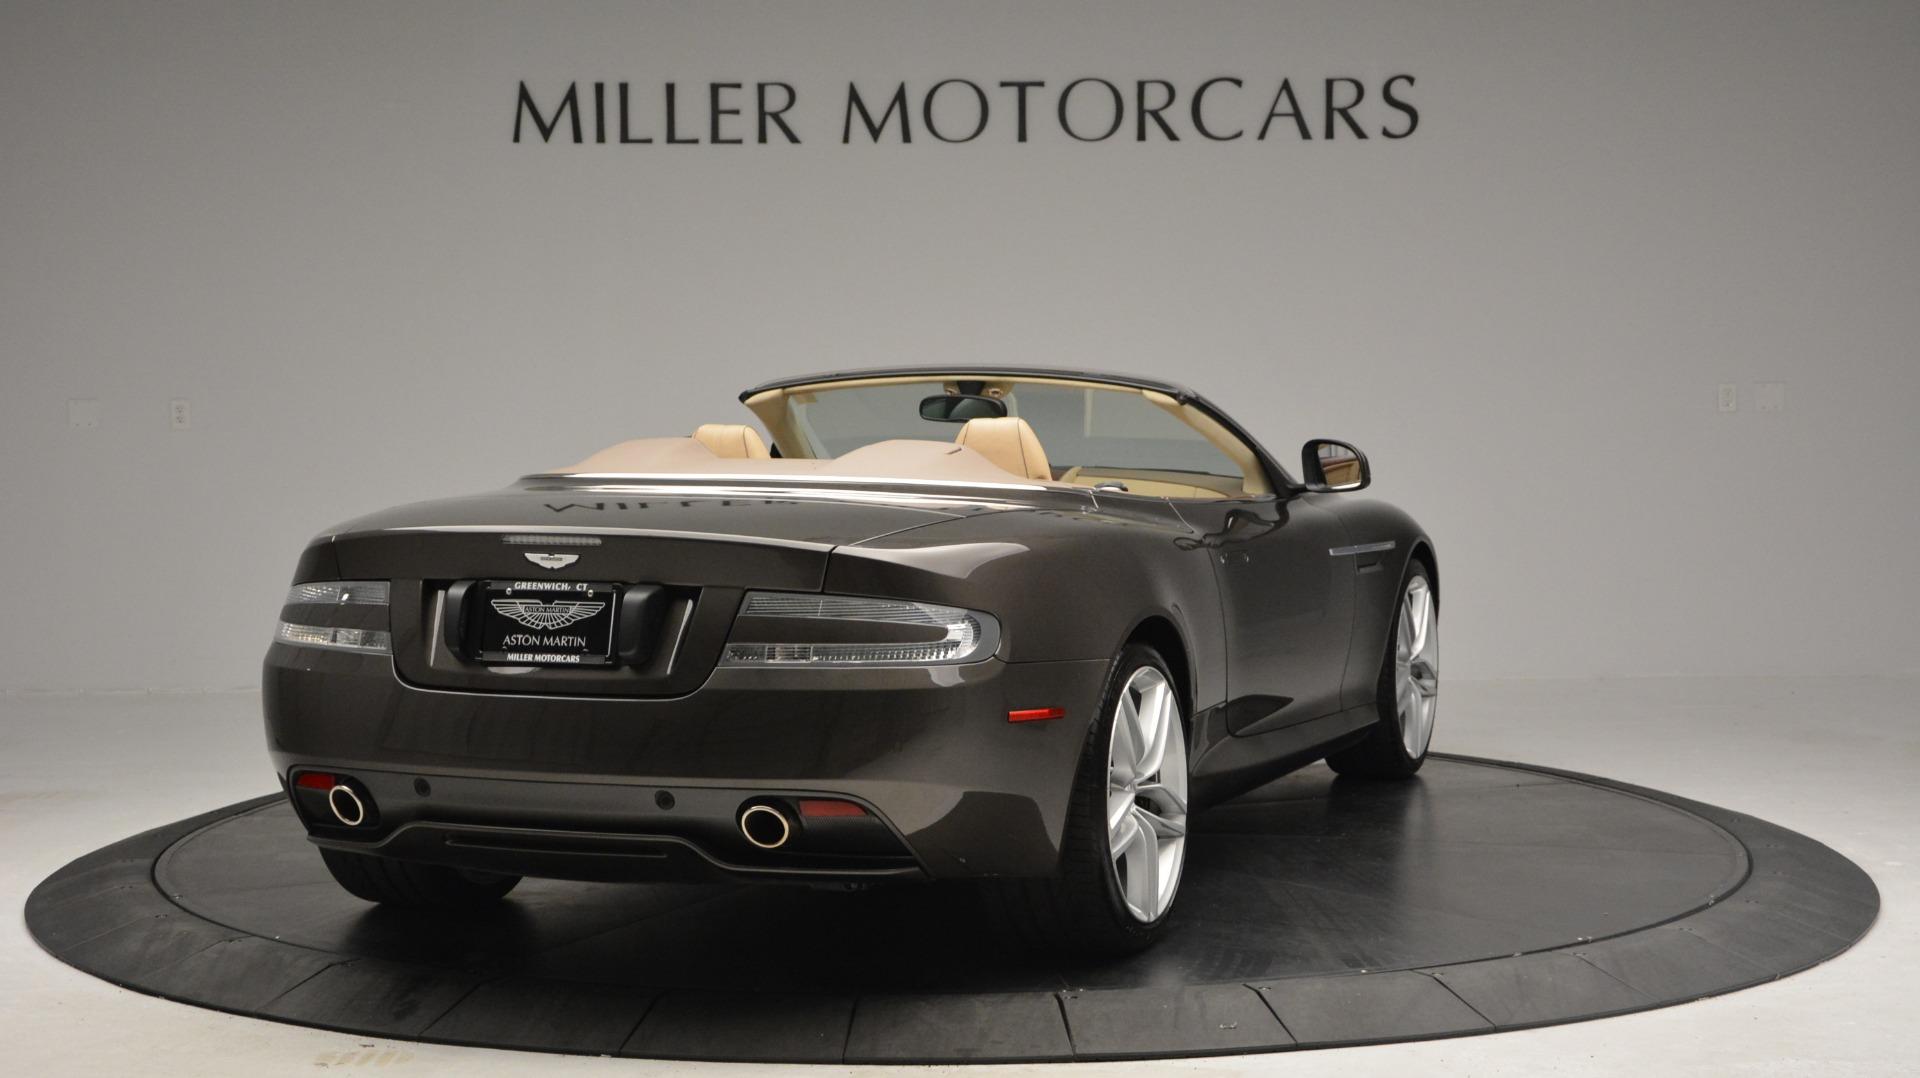 Used 2012 Aston Martin Virage Convertible For Sale In Greenwich, CT. Alfa Romeo of Greenwich, 7613 3351_p7